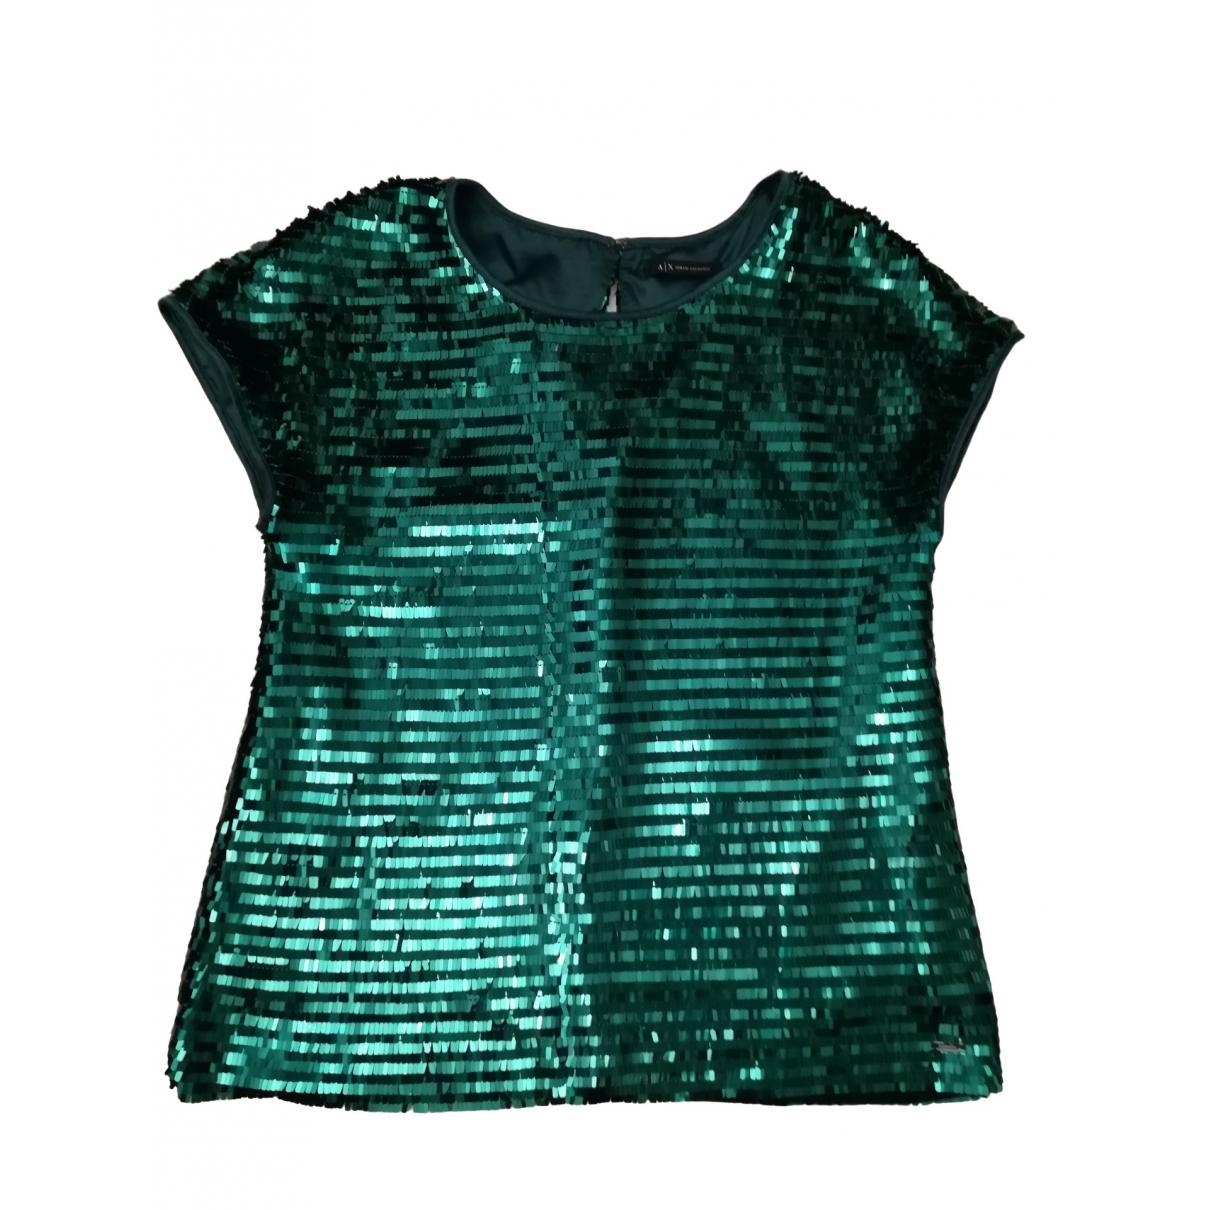 Emporio Armani \N Green  top for Women S International